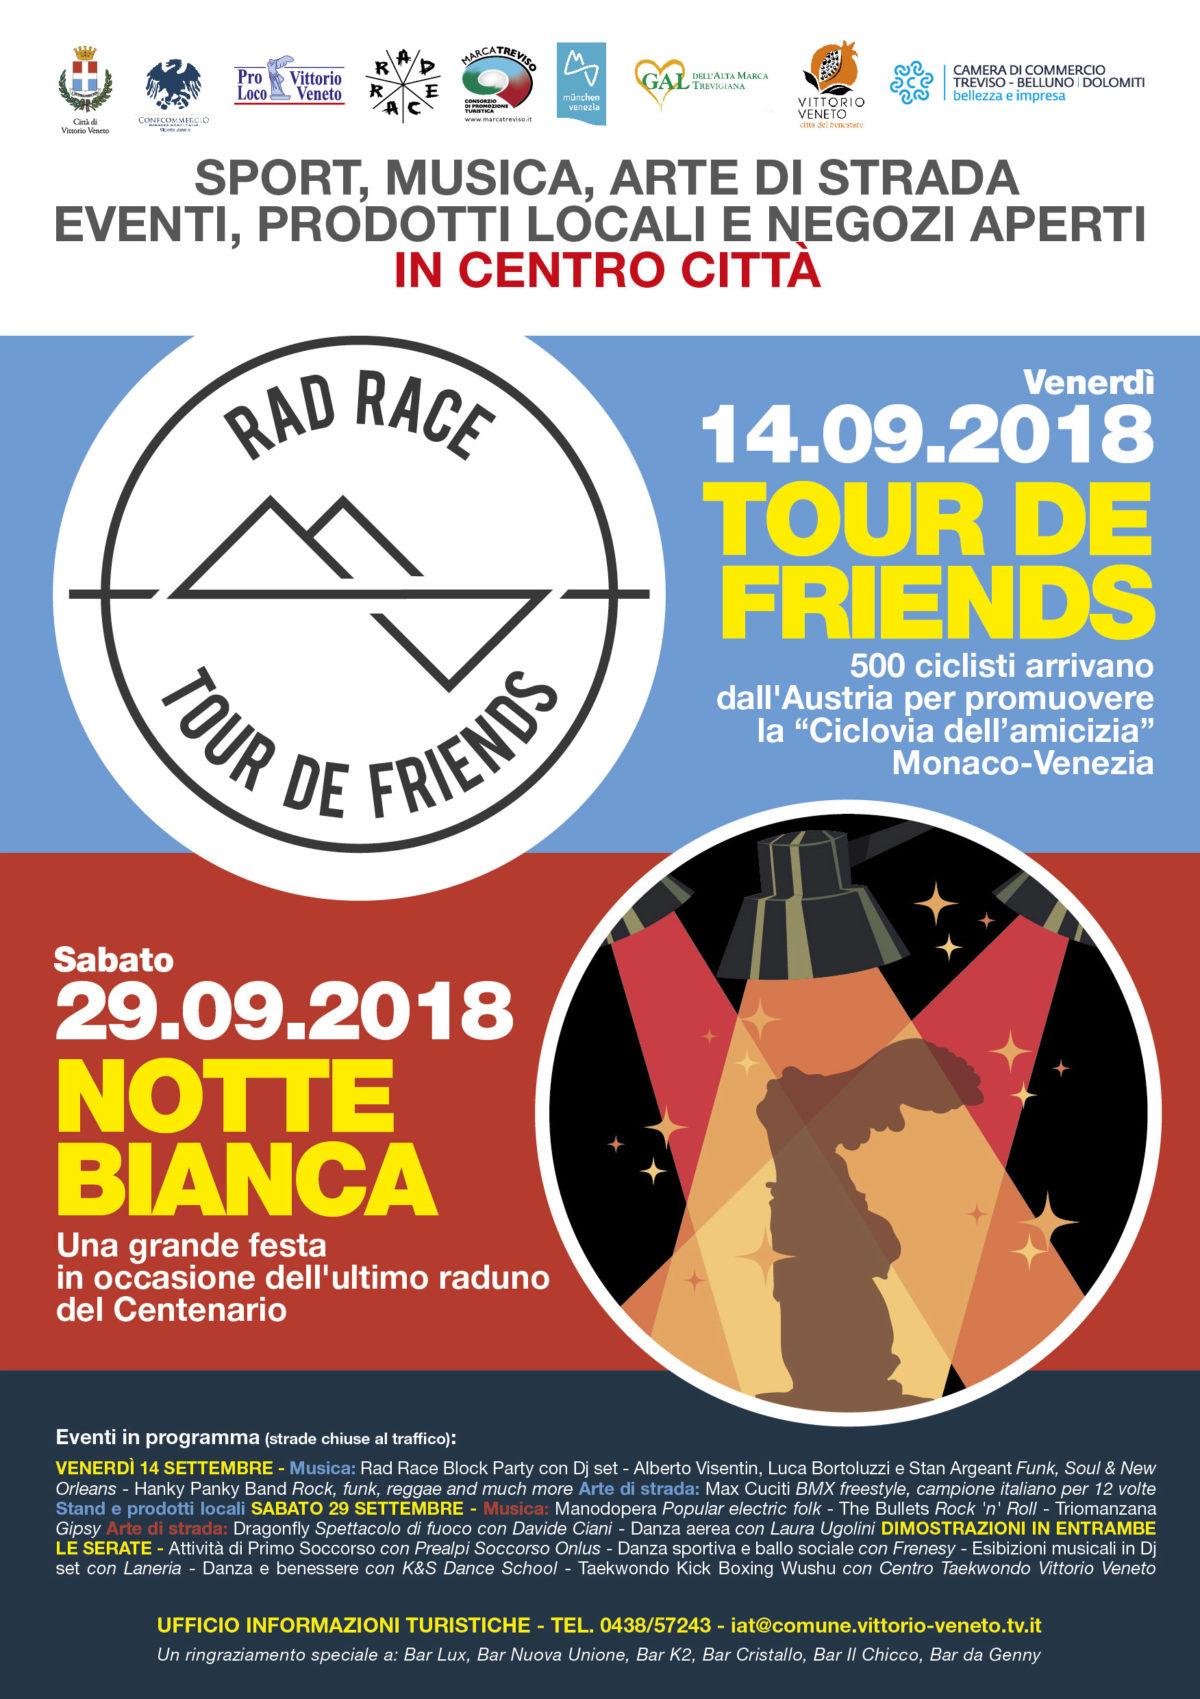 14.09.2018 TOUR DE FRIENDS - Vittorio Veneto